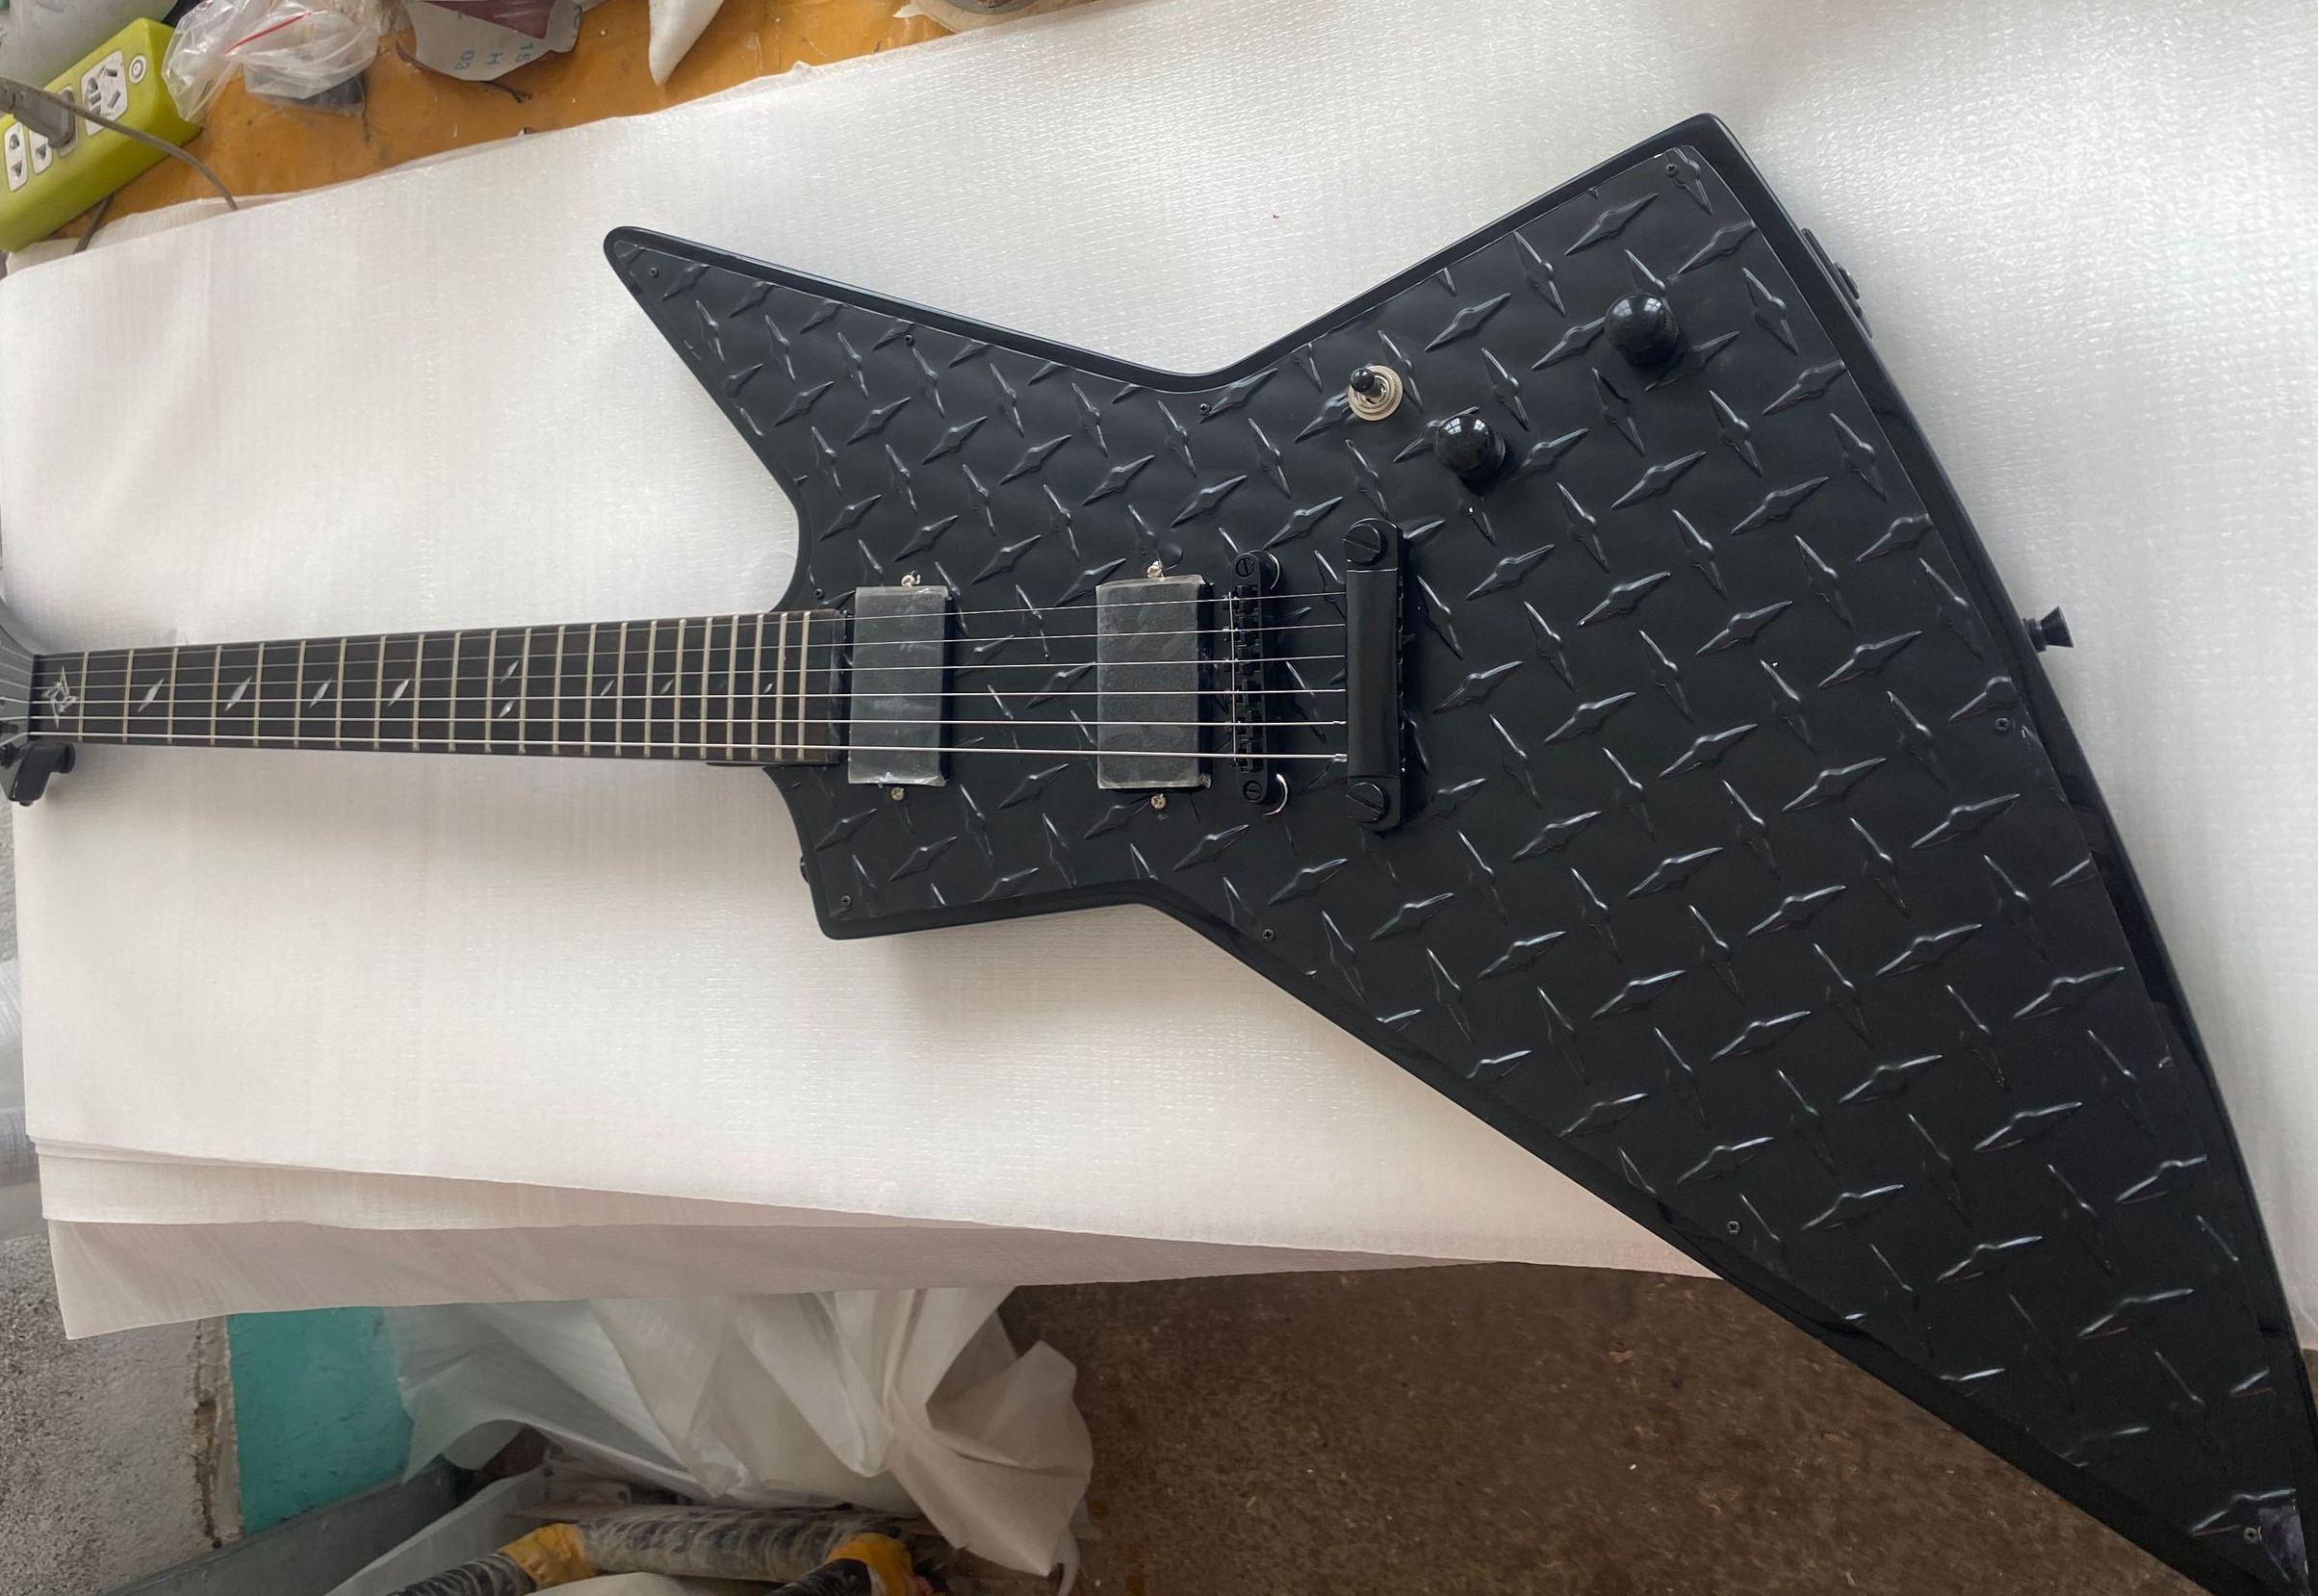 MX250 James Hetfield Matte Black Diamond Plate Explorer Guitar Electric Guitar Stars Inlay, China EMG Pickups, Super rare Ax